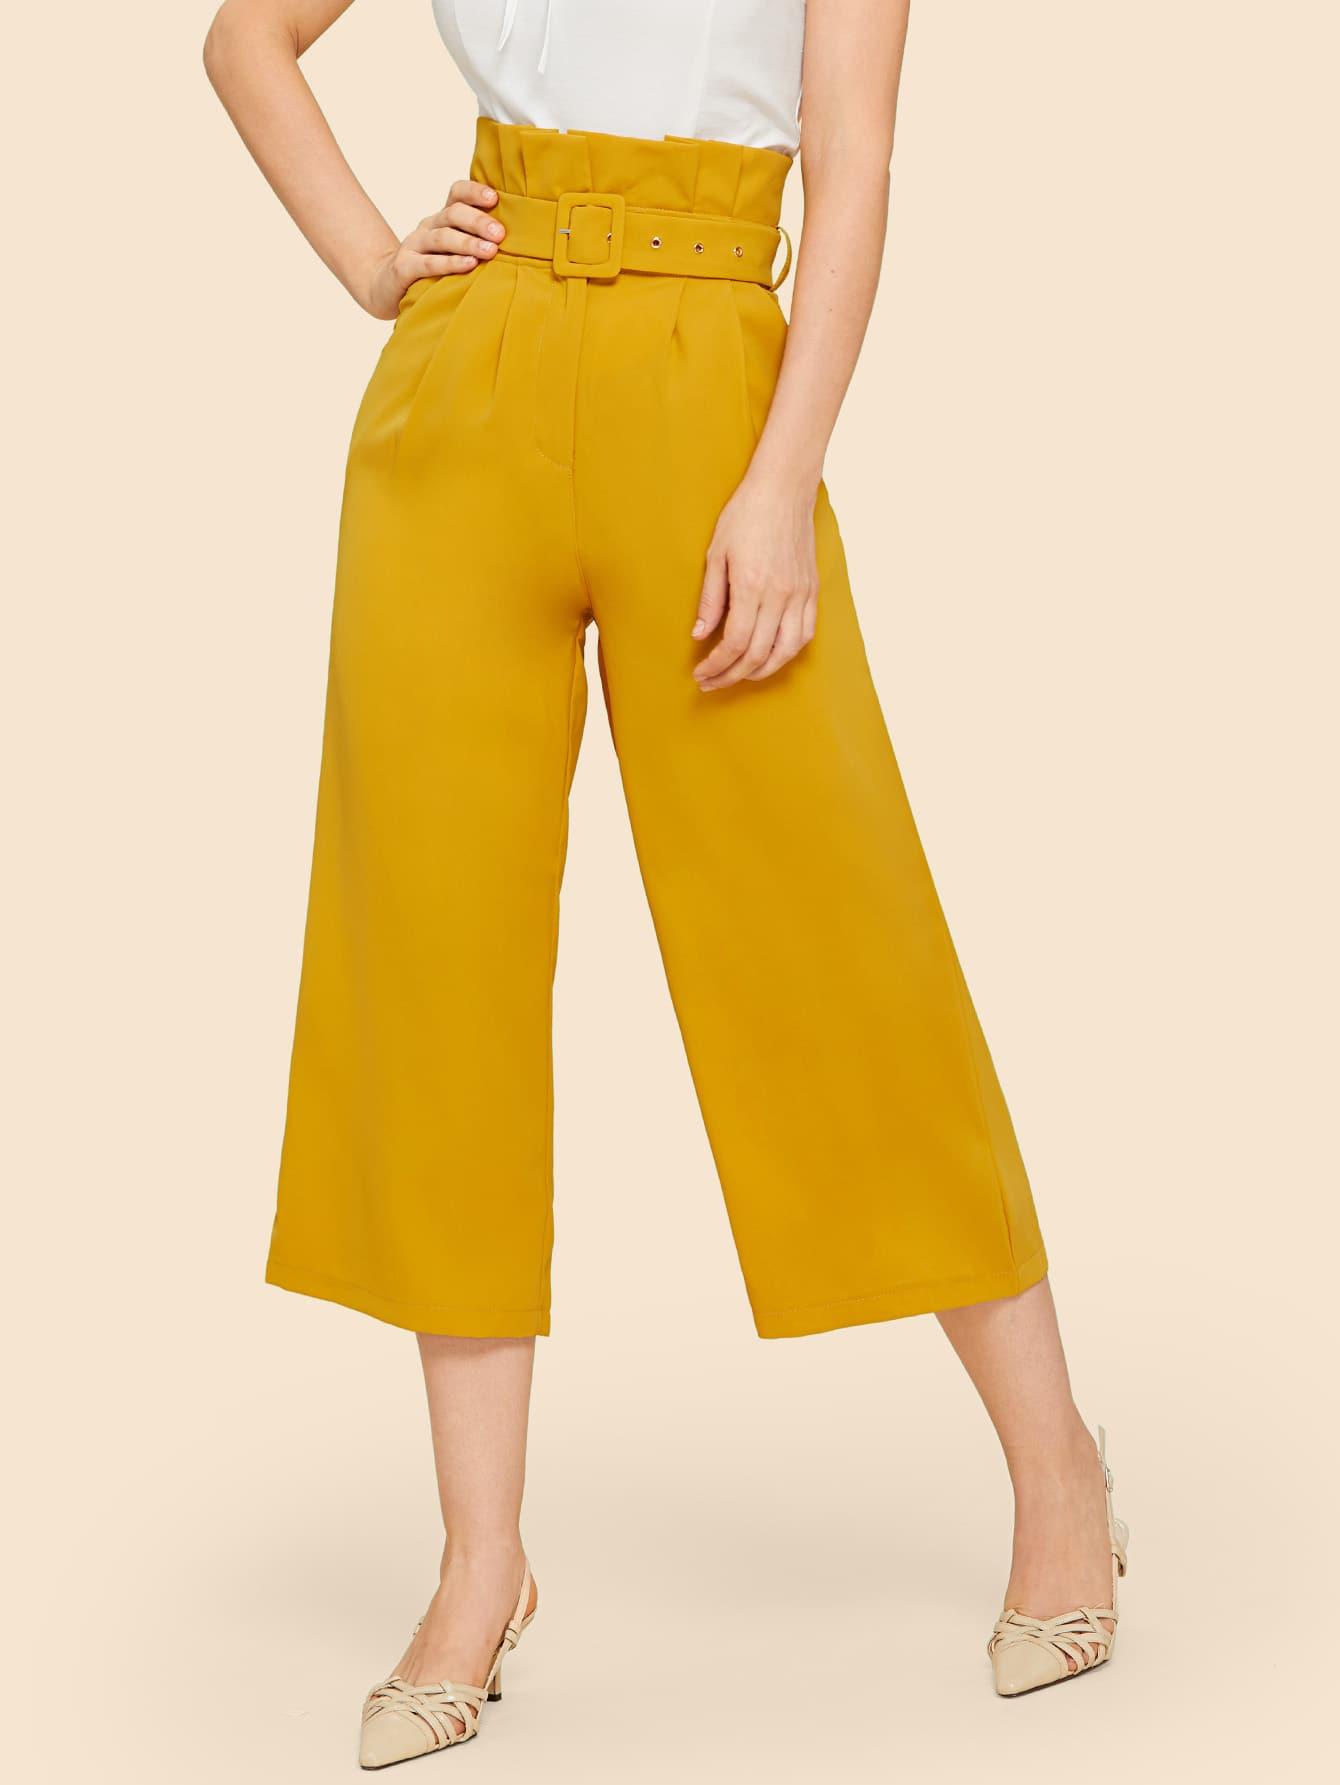 High Waist Wide Leg Pants s xxl 2018 skinny slim high waist pencil pants women stretch sexy denim jeans bodycon leg split trousers